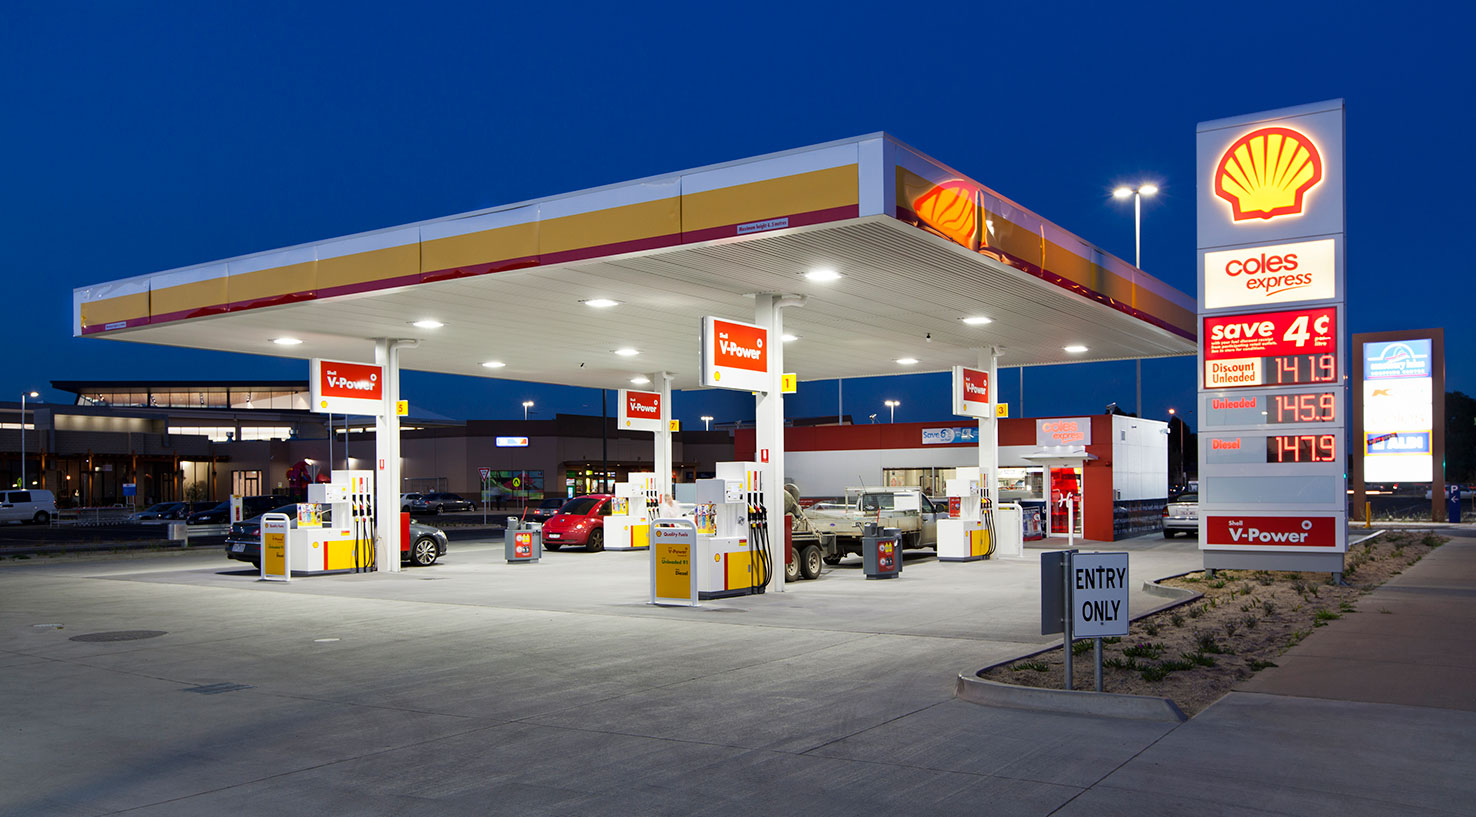 Coles Express expensive fuel